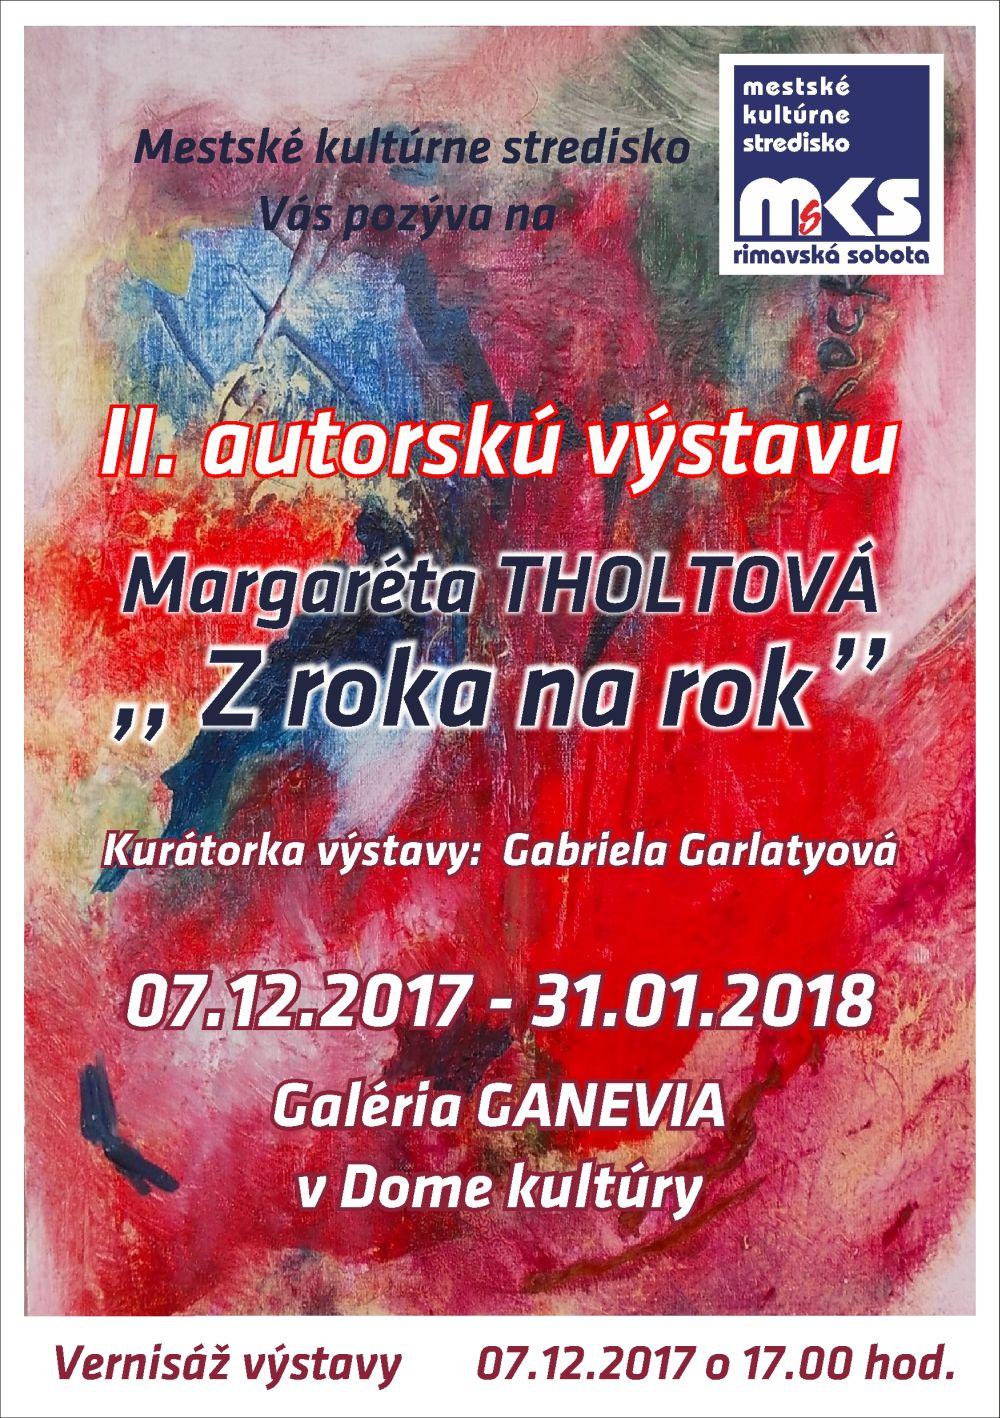 Margaréta Tholtová: olejomaľba @ Galéria GANEVIA, Dom kultúry Rimavská Sobota | Slovensko